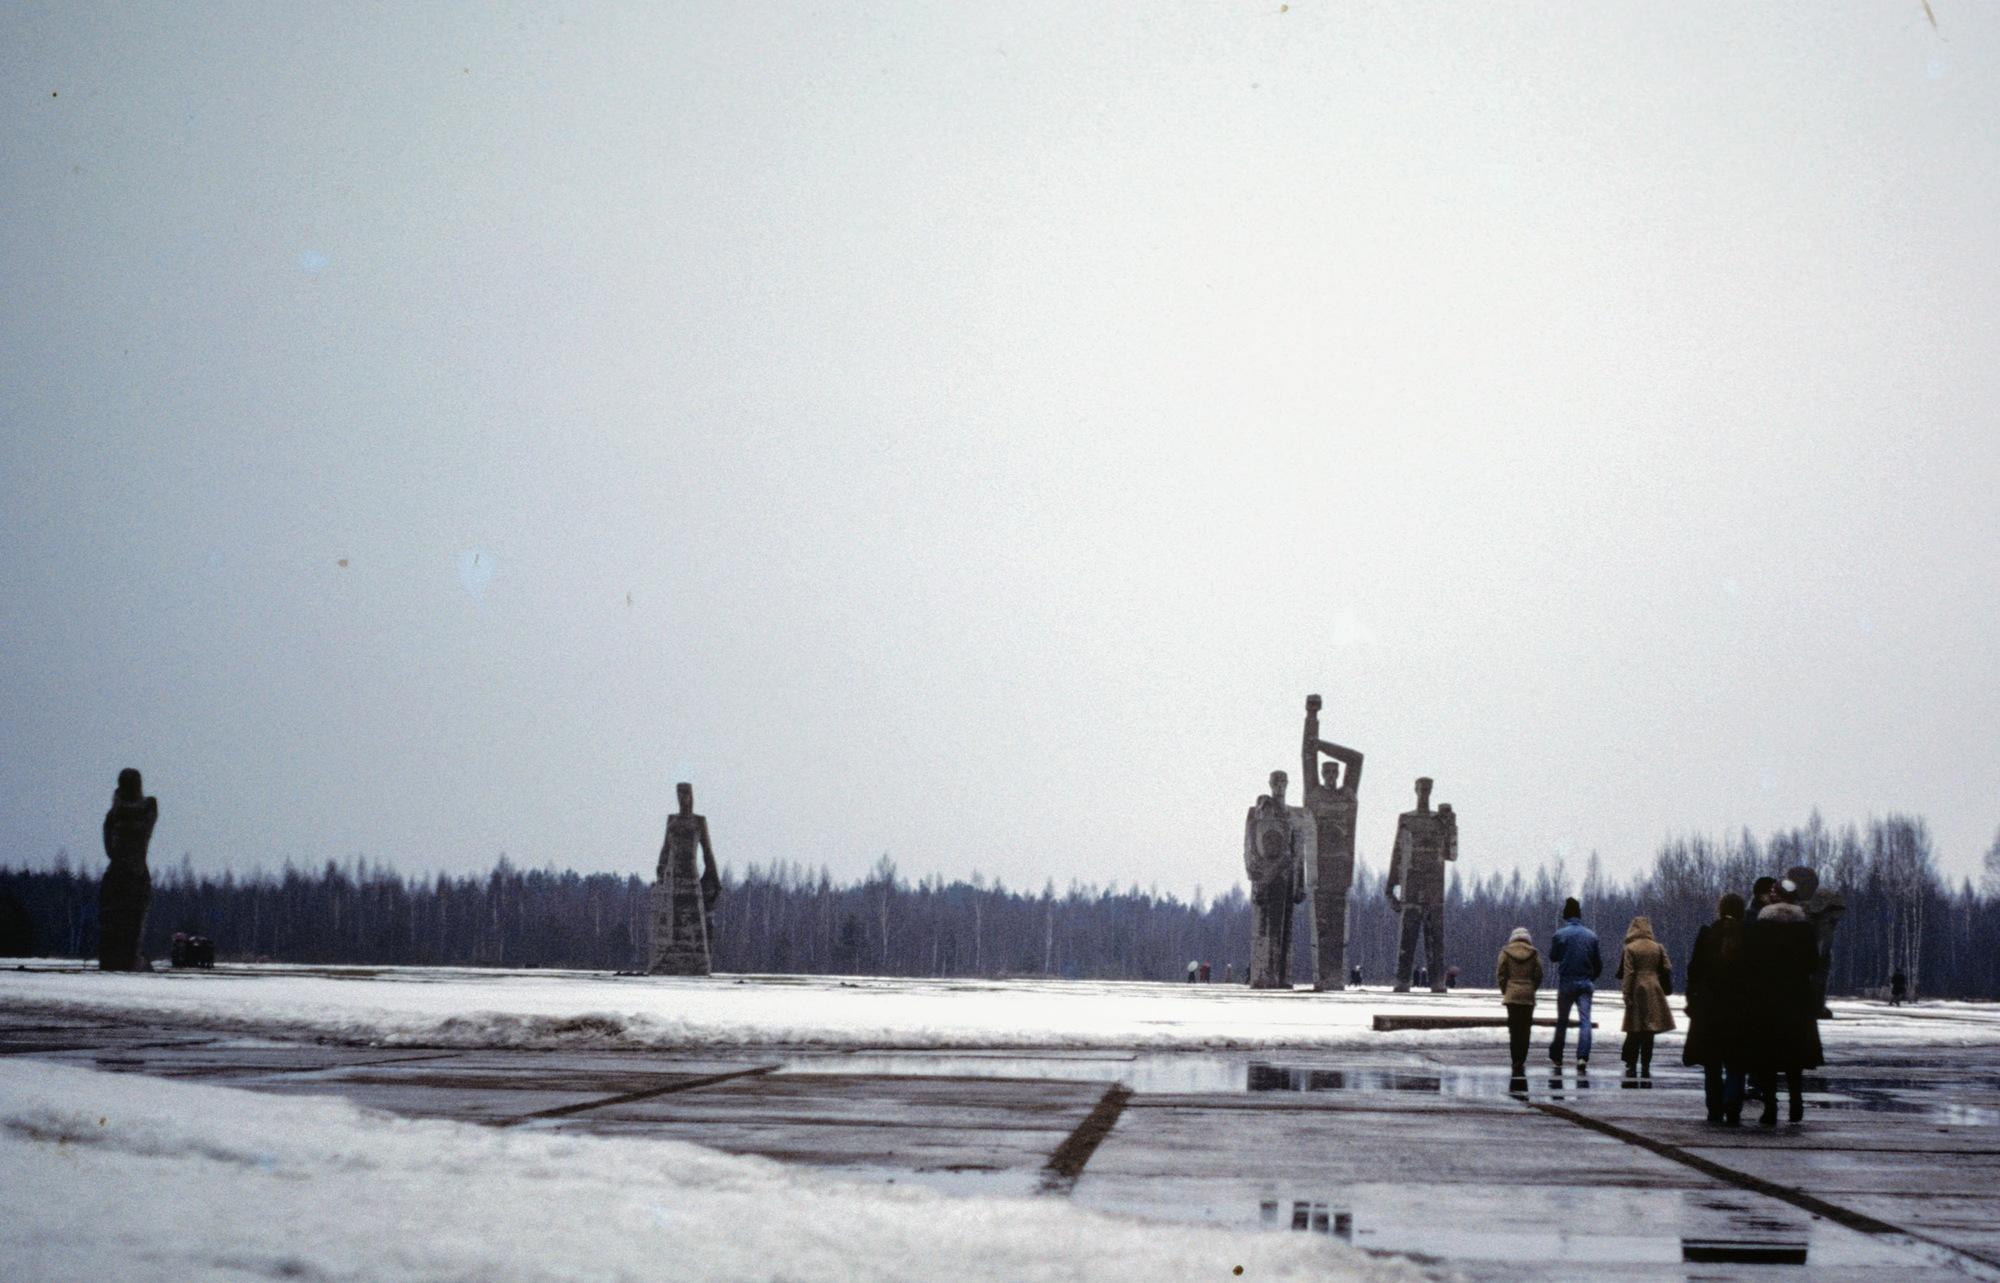 Ms2020_001_BurtonDoug_B1_F8_7_1979_Soviet_Union_001.jpg